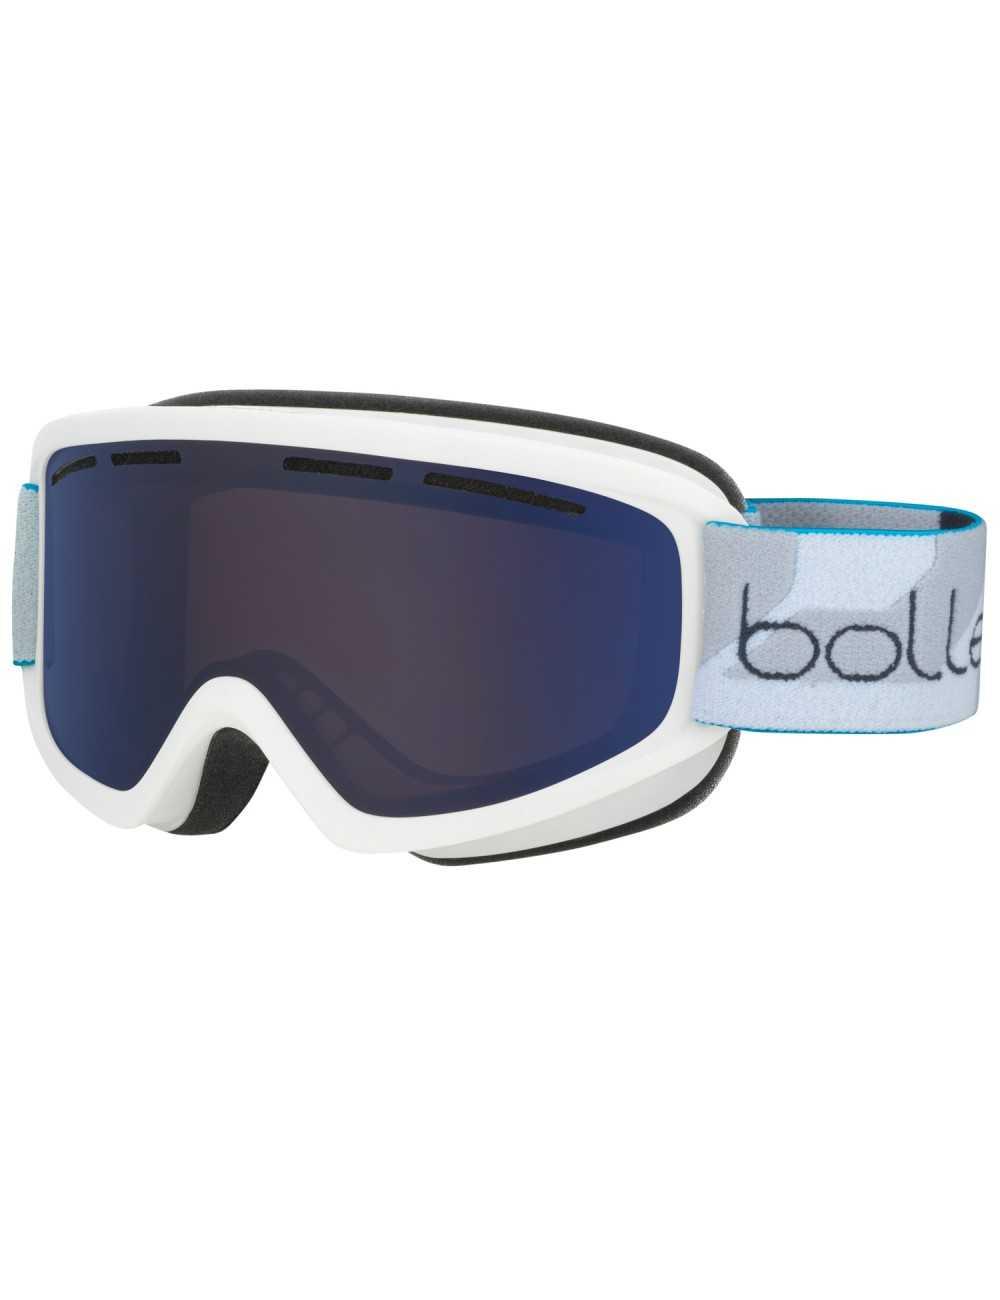 Bolle Goggle 21808 Schuss